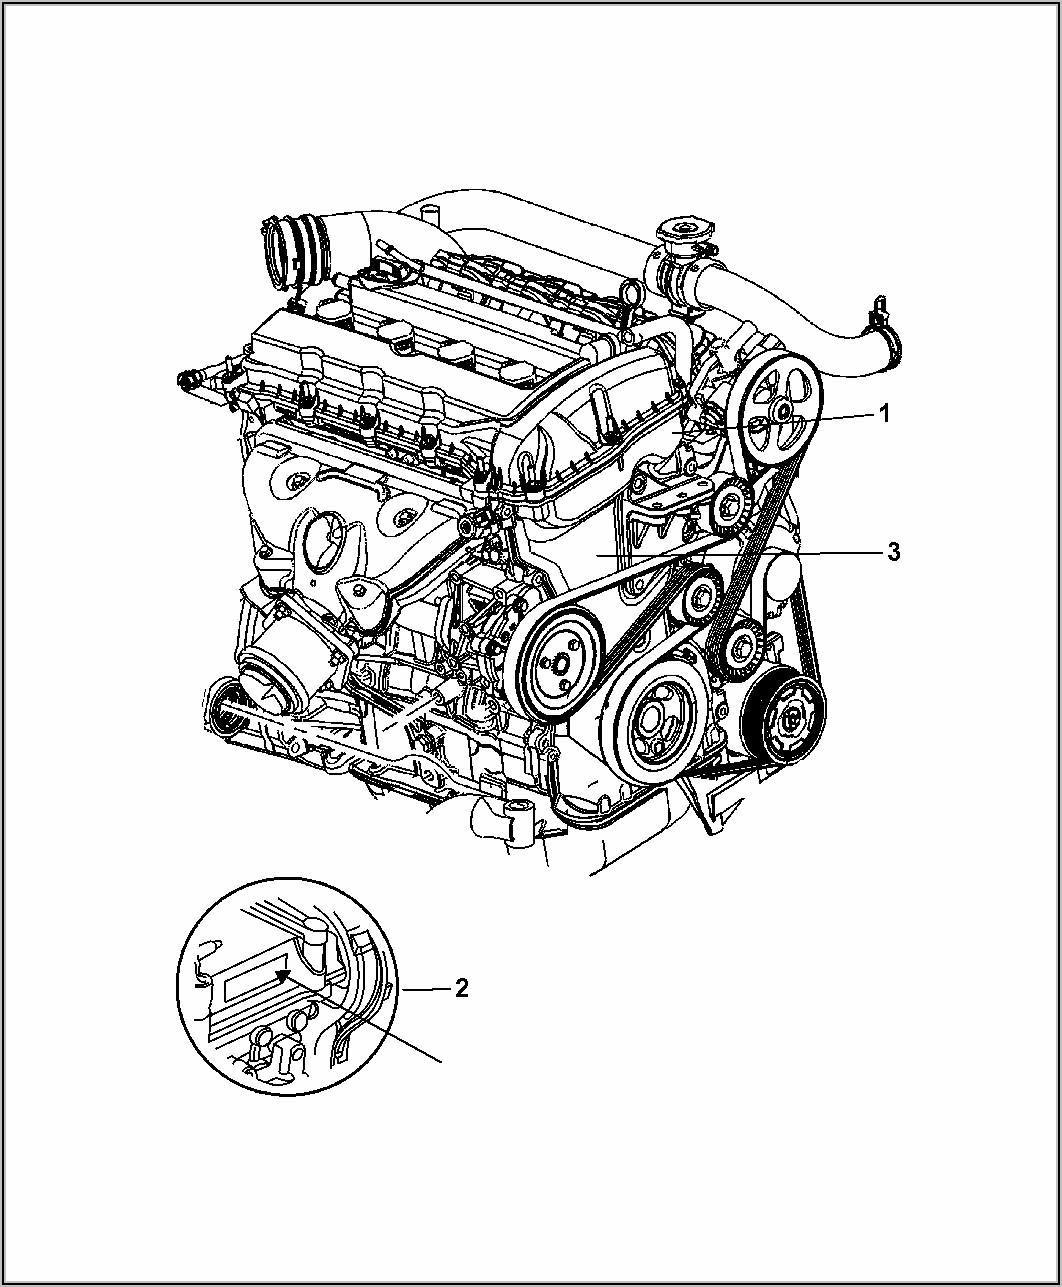 Serpentine Belt Diagram 2013 Dodge Avenger